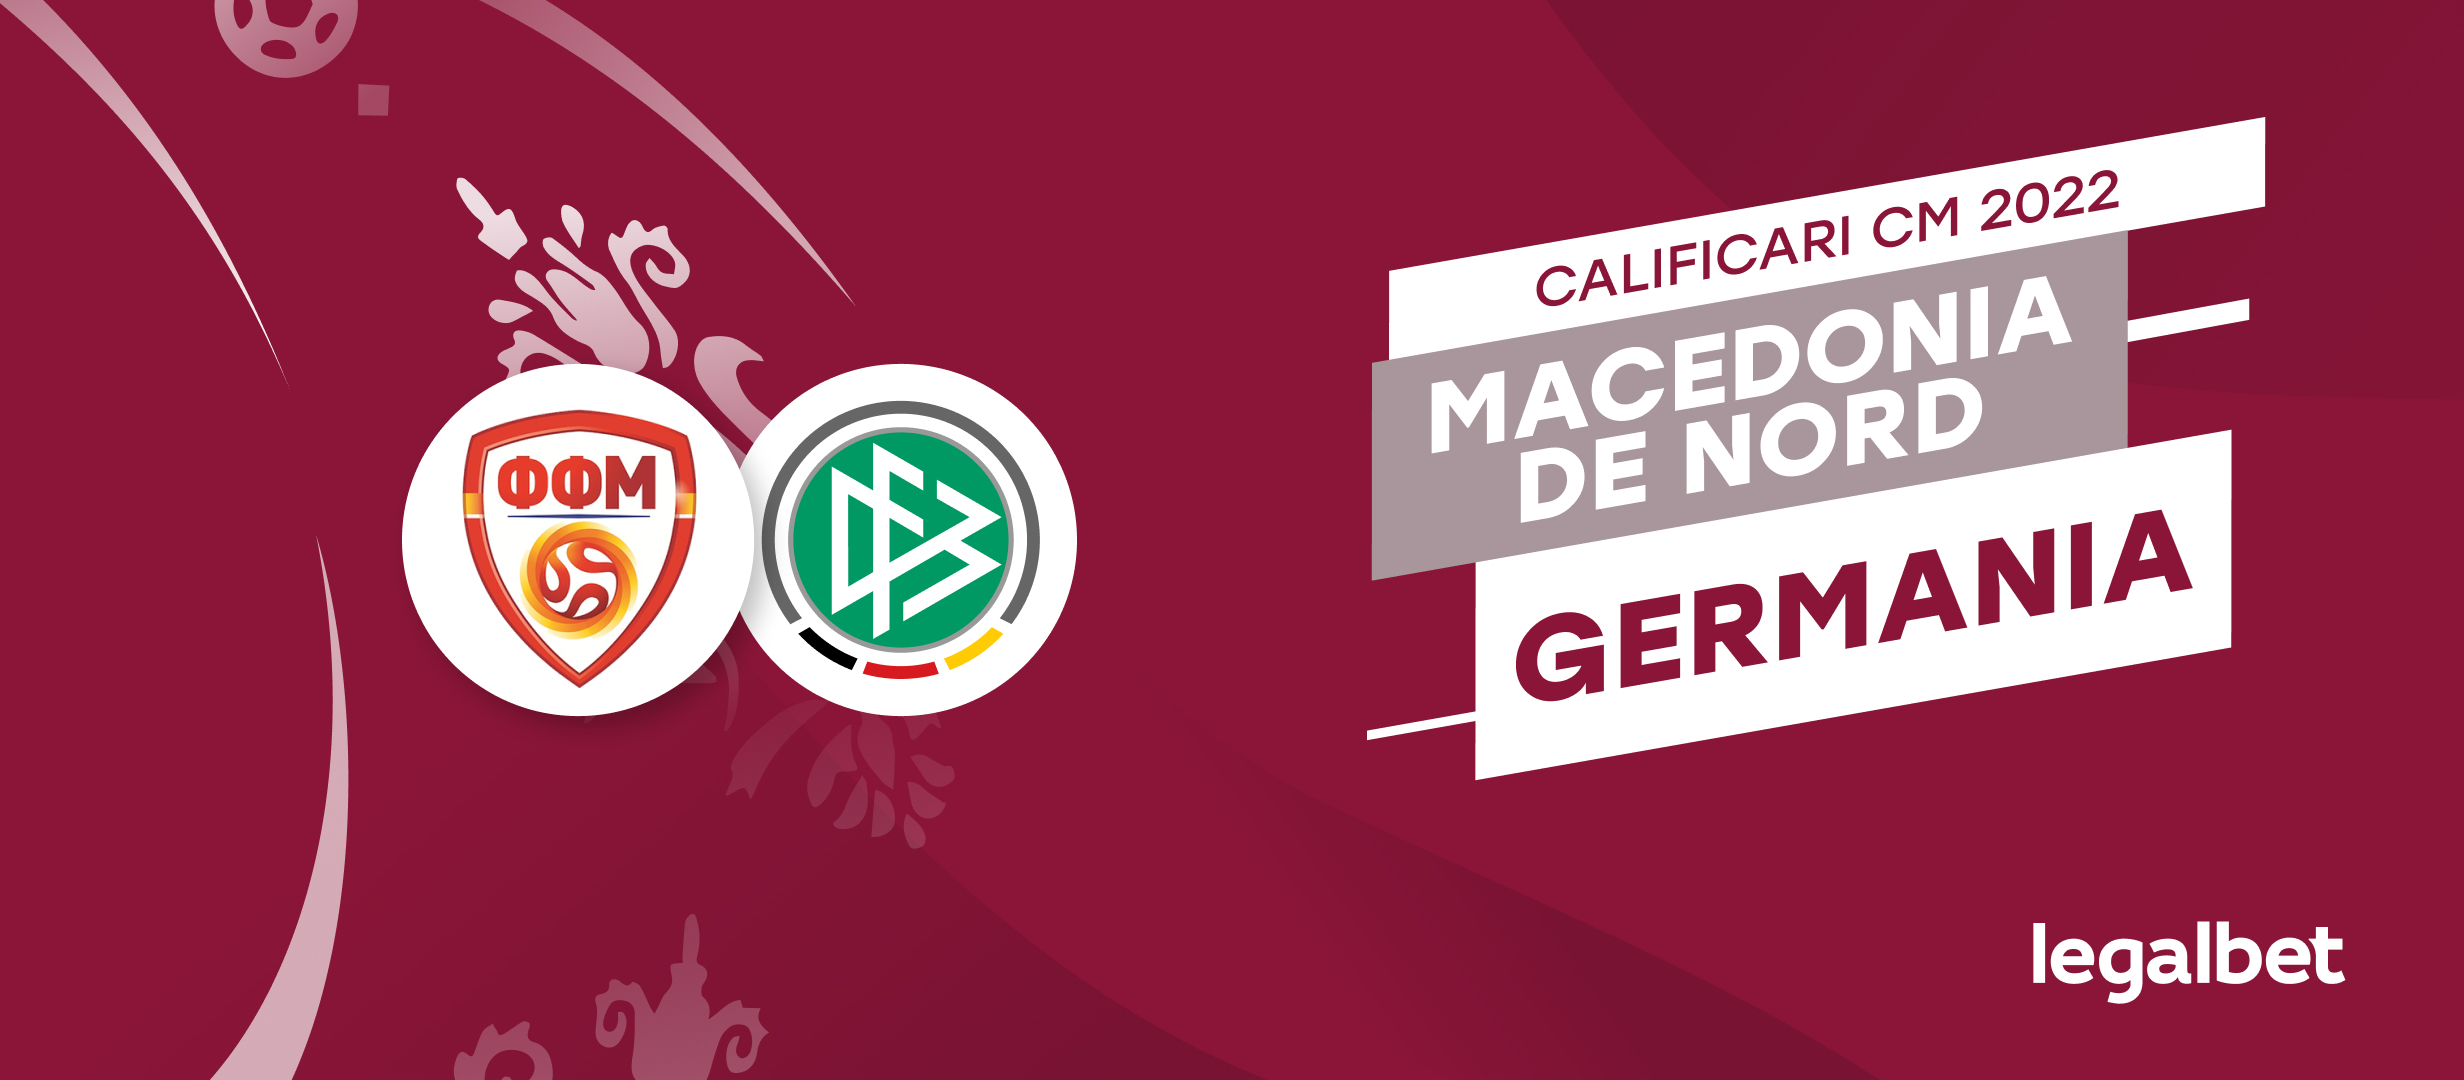 Pariuri si cote pentru Macedonia vs Germania, meci din preliminarile CM 2022